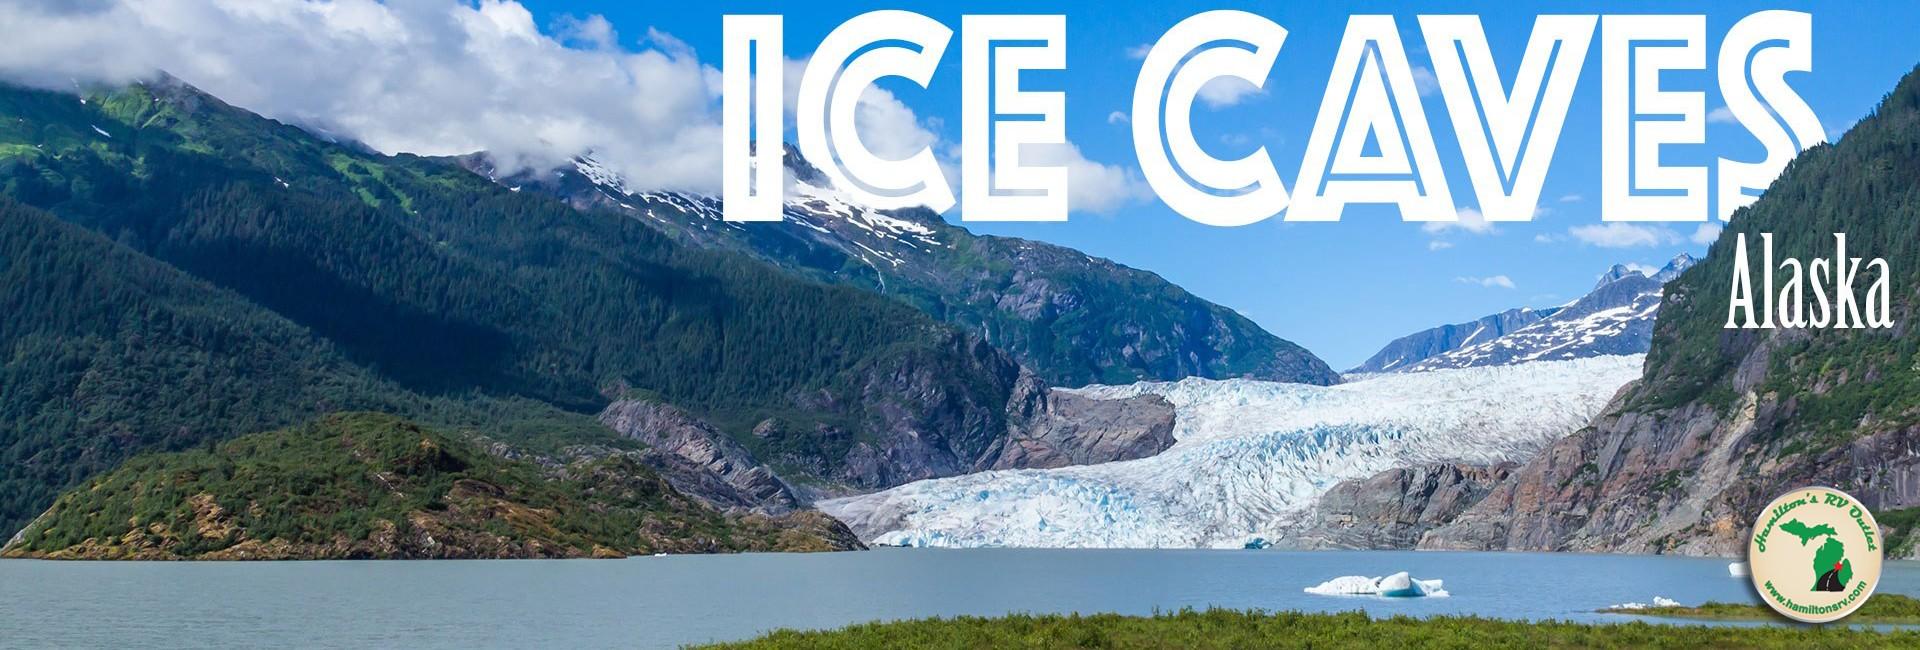 HAMRV-Mendenhall-Glacier-Banner